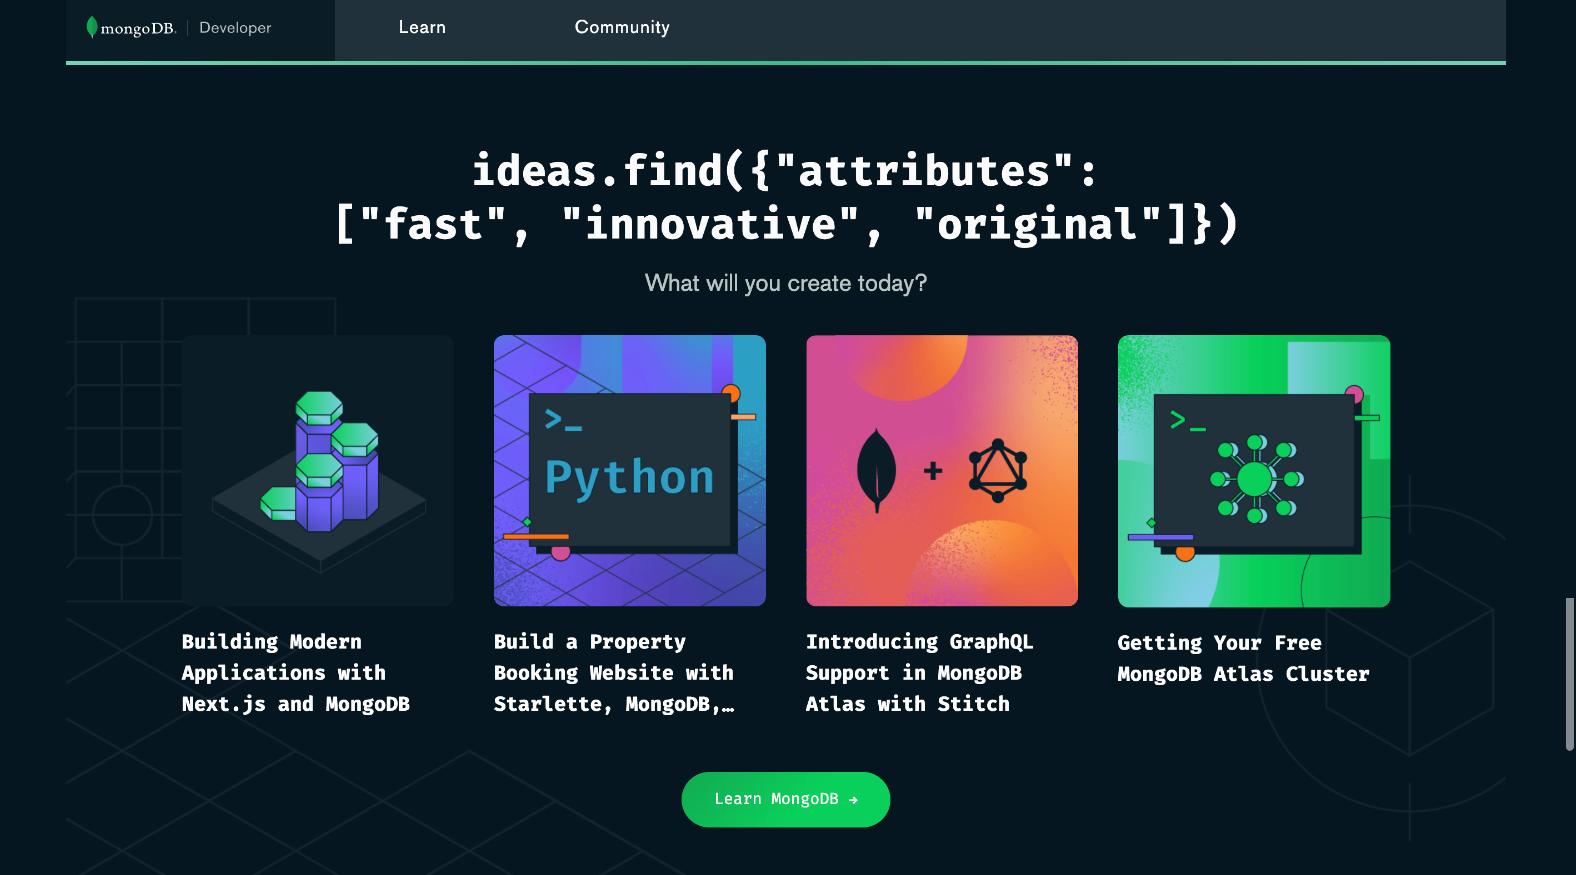 MongoDB Developer Hub Home Page